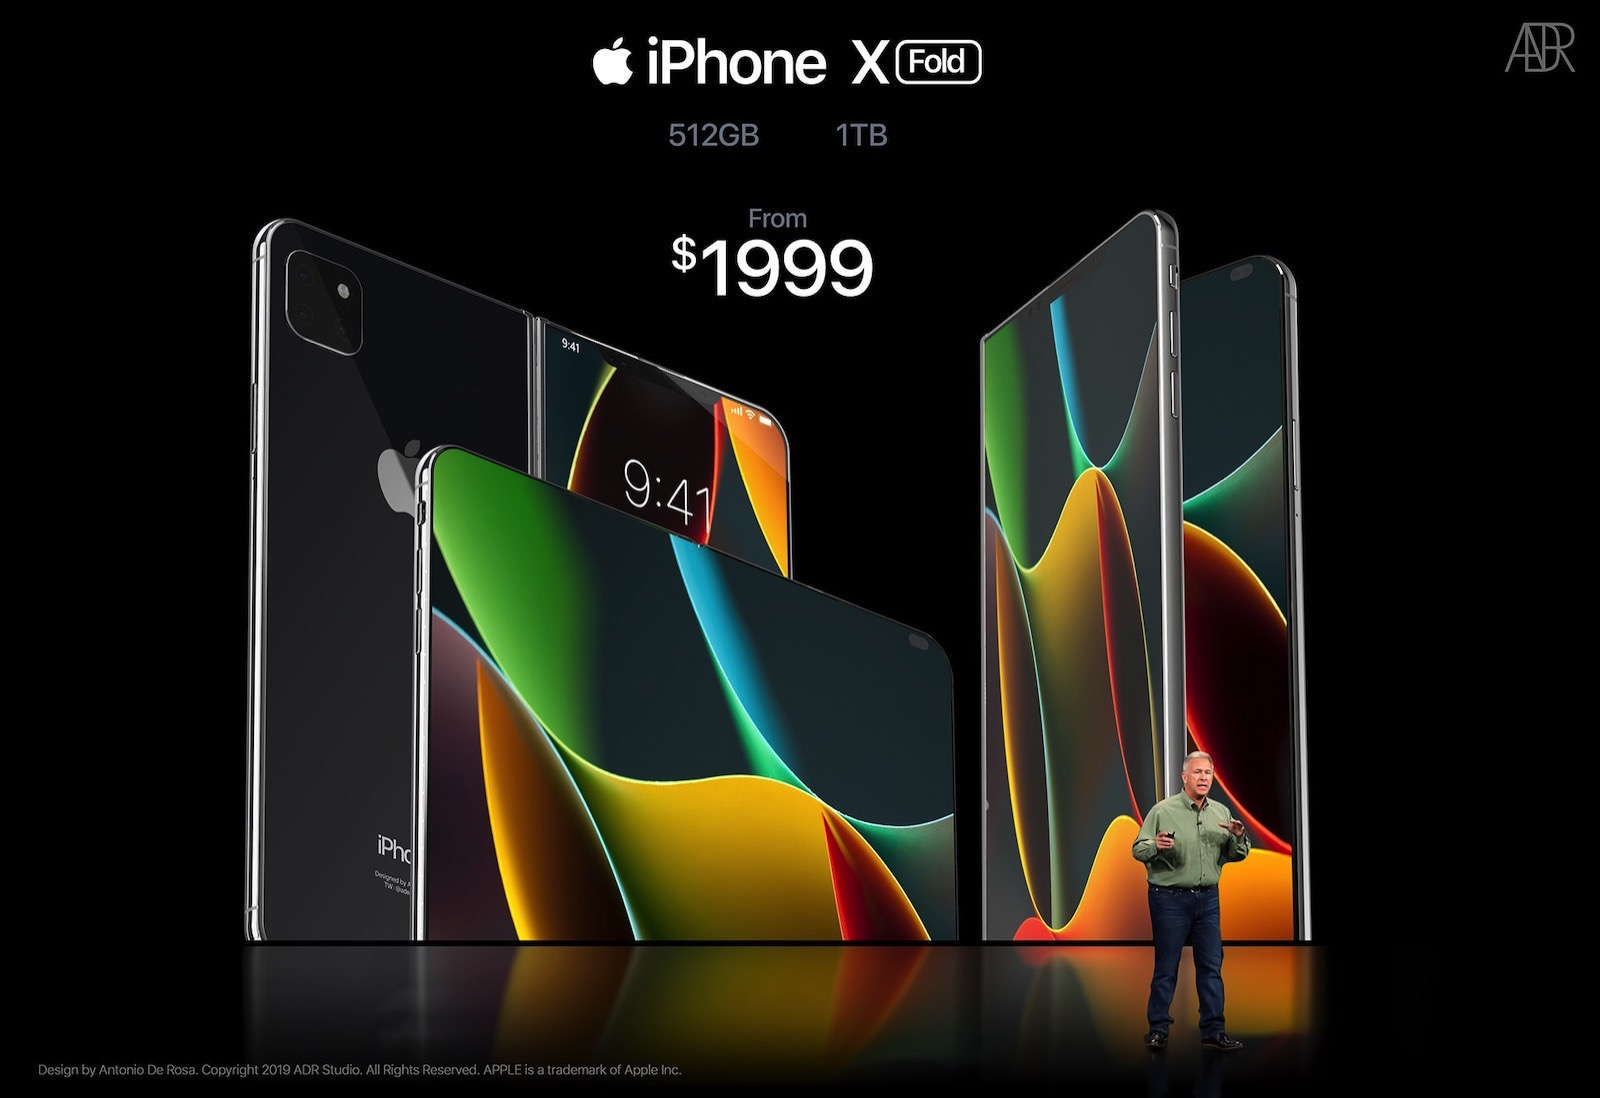 iphone-x-fold-concept-image-2.jpg